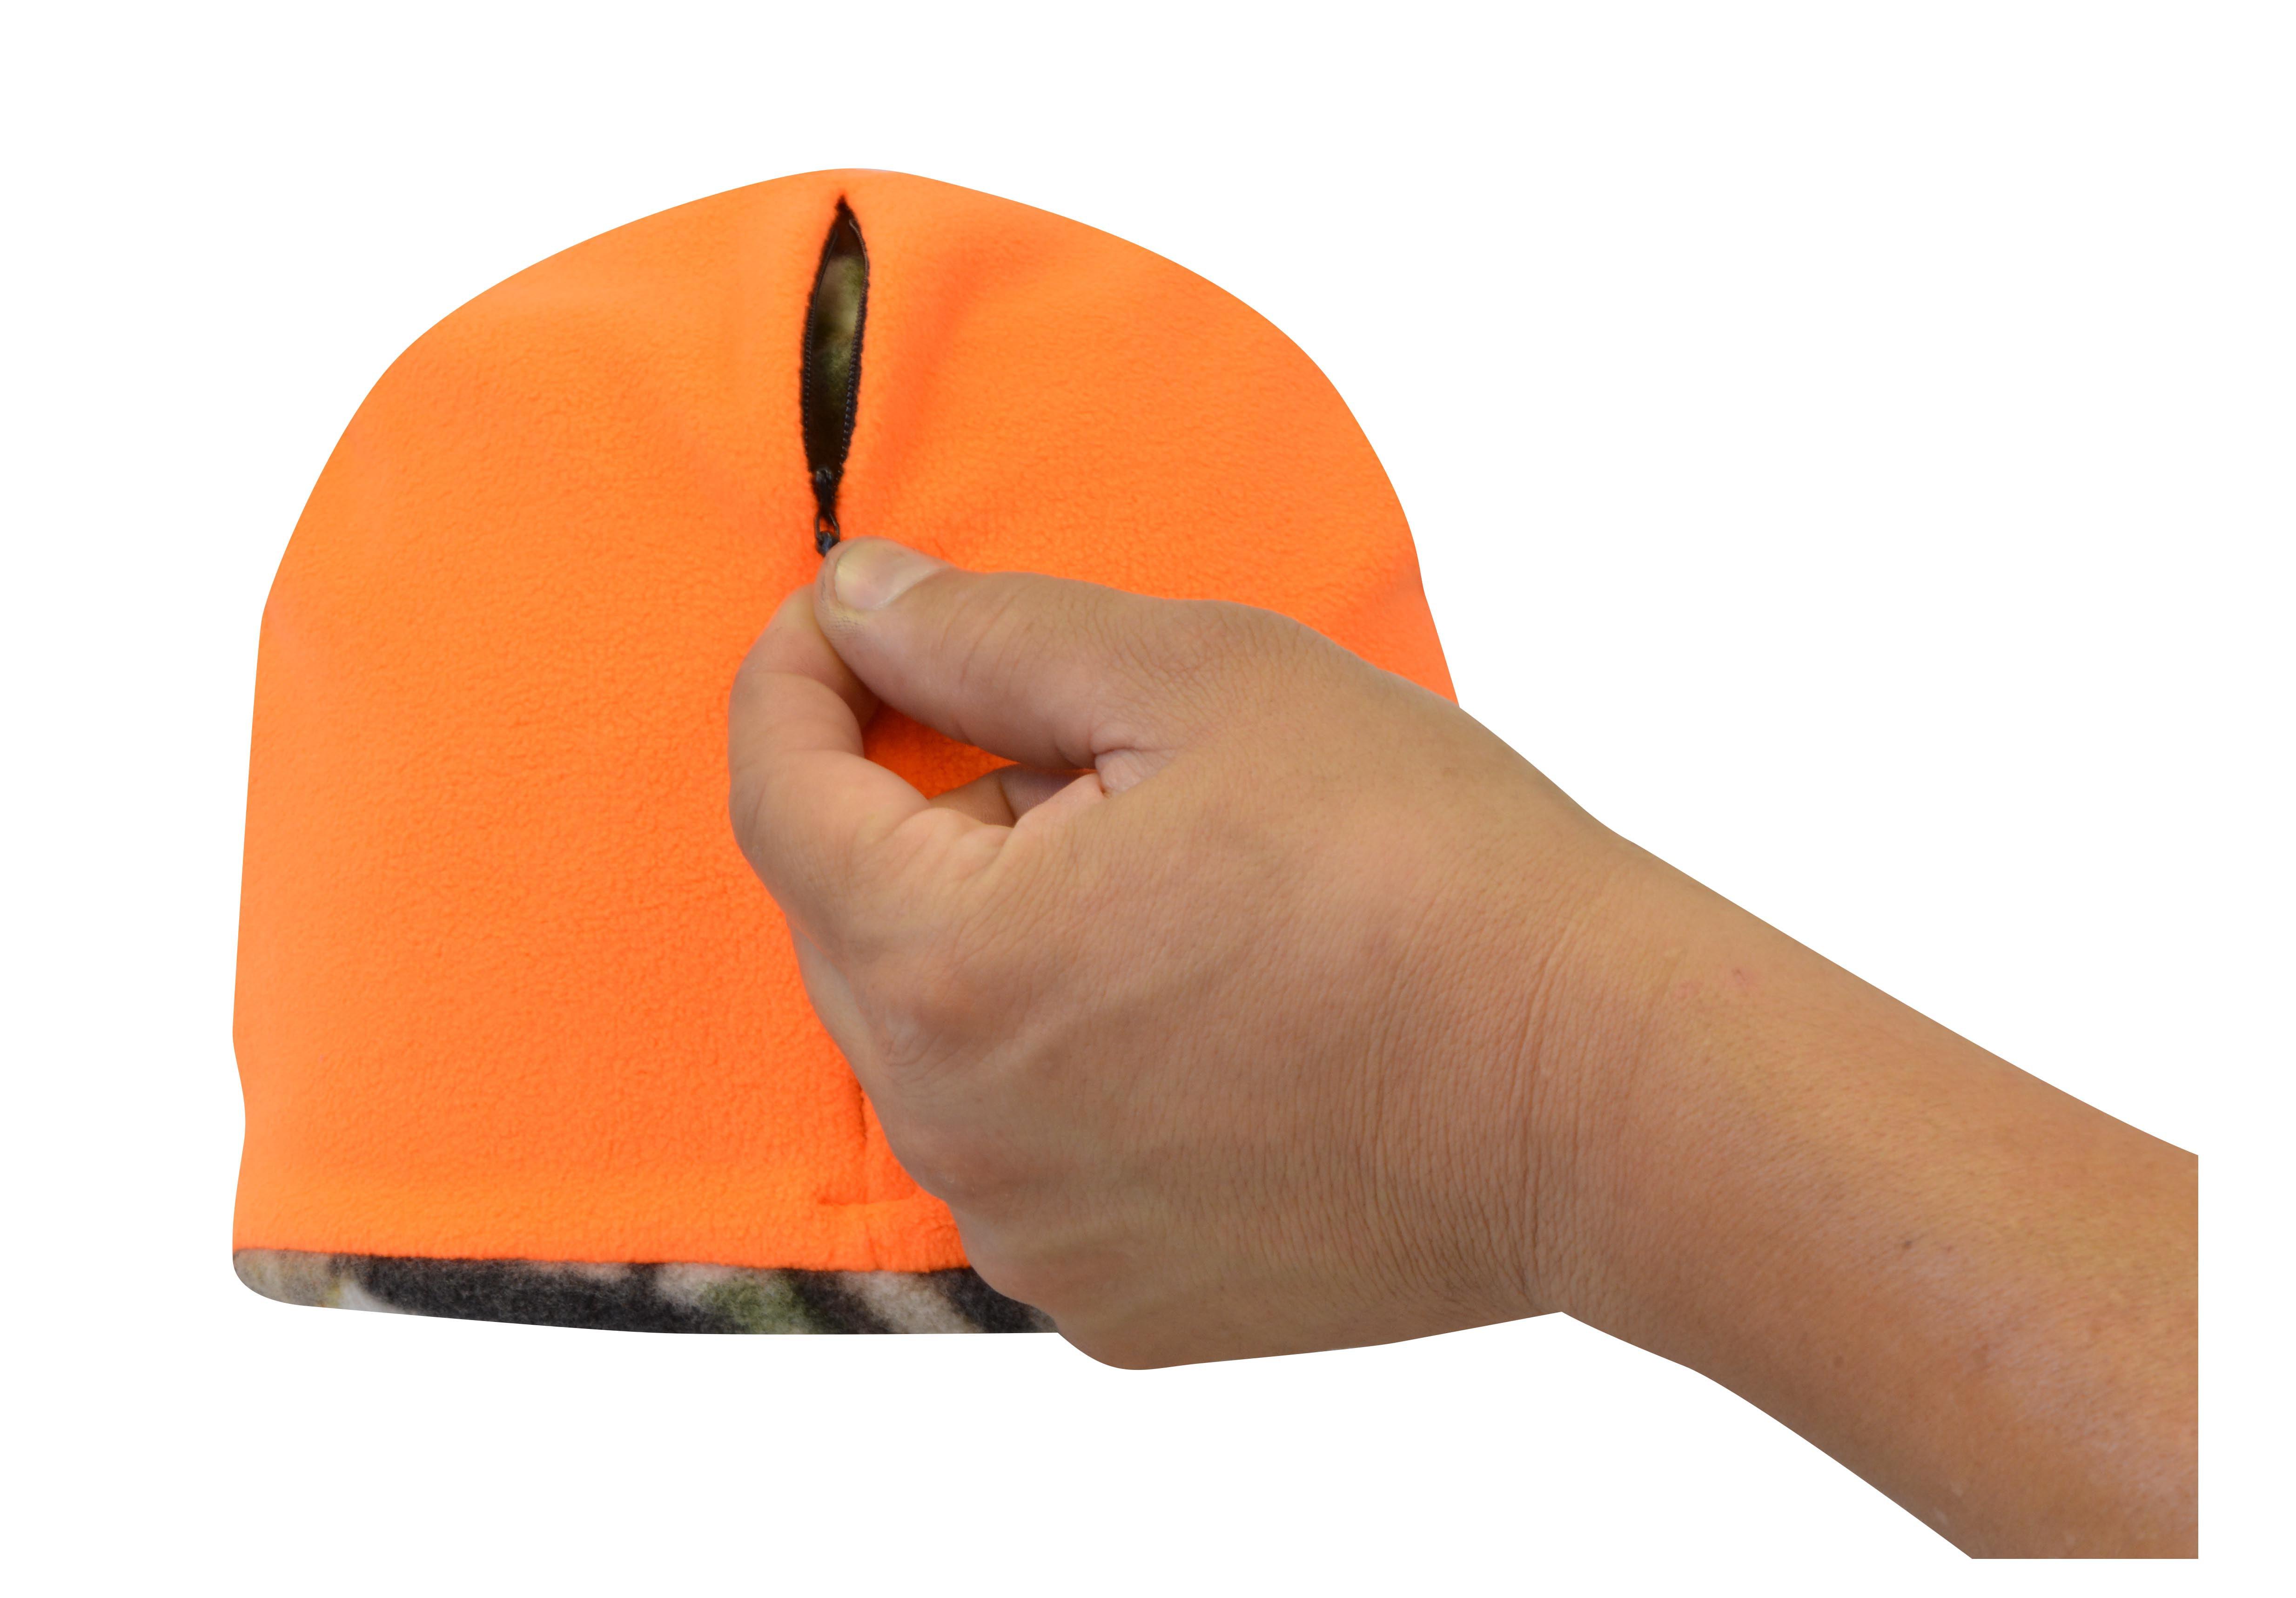 KC Caps Premium Unisex Winter Mossy Oak Reversible Hunting Orange Fleece  Beanie Hat Cap W  Hidden Zipper Storage Pocket - Walmart.com 0f83721ee1ea